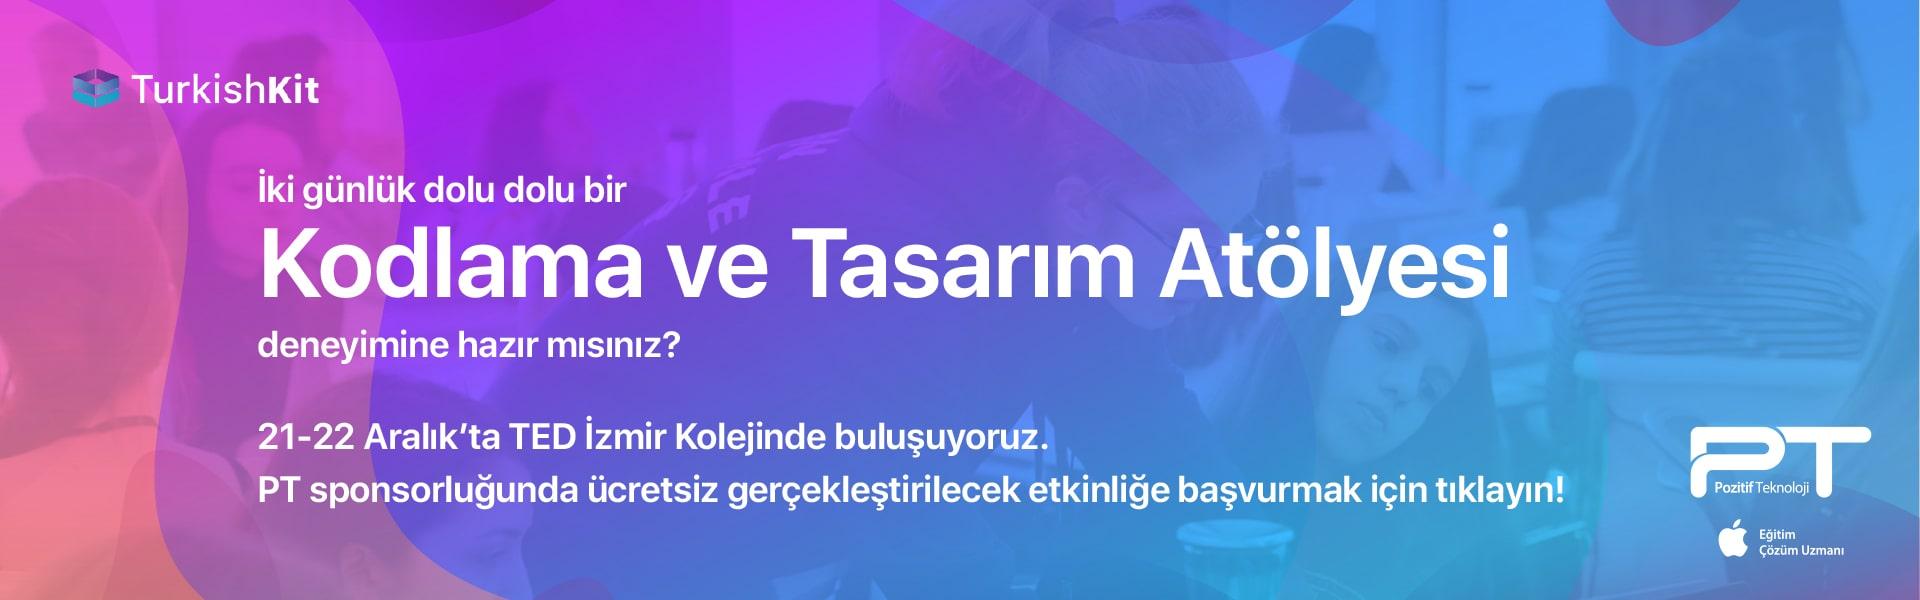 Turkish Kits Etkinliği